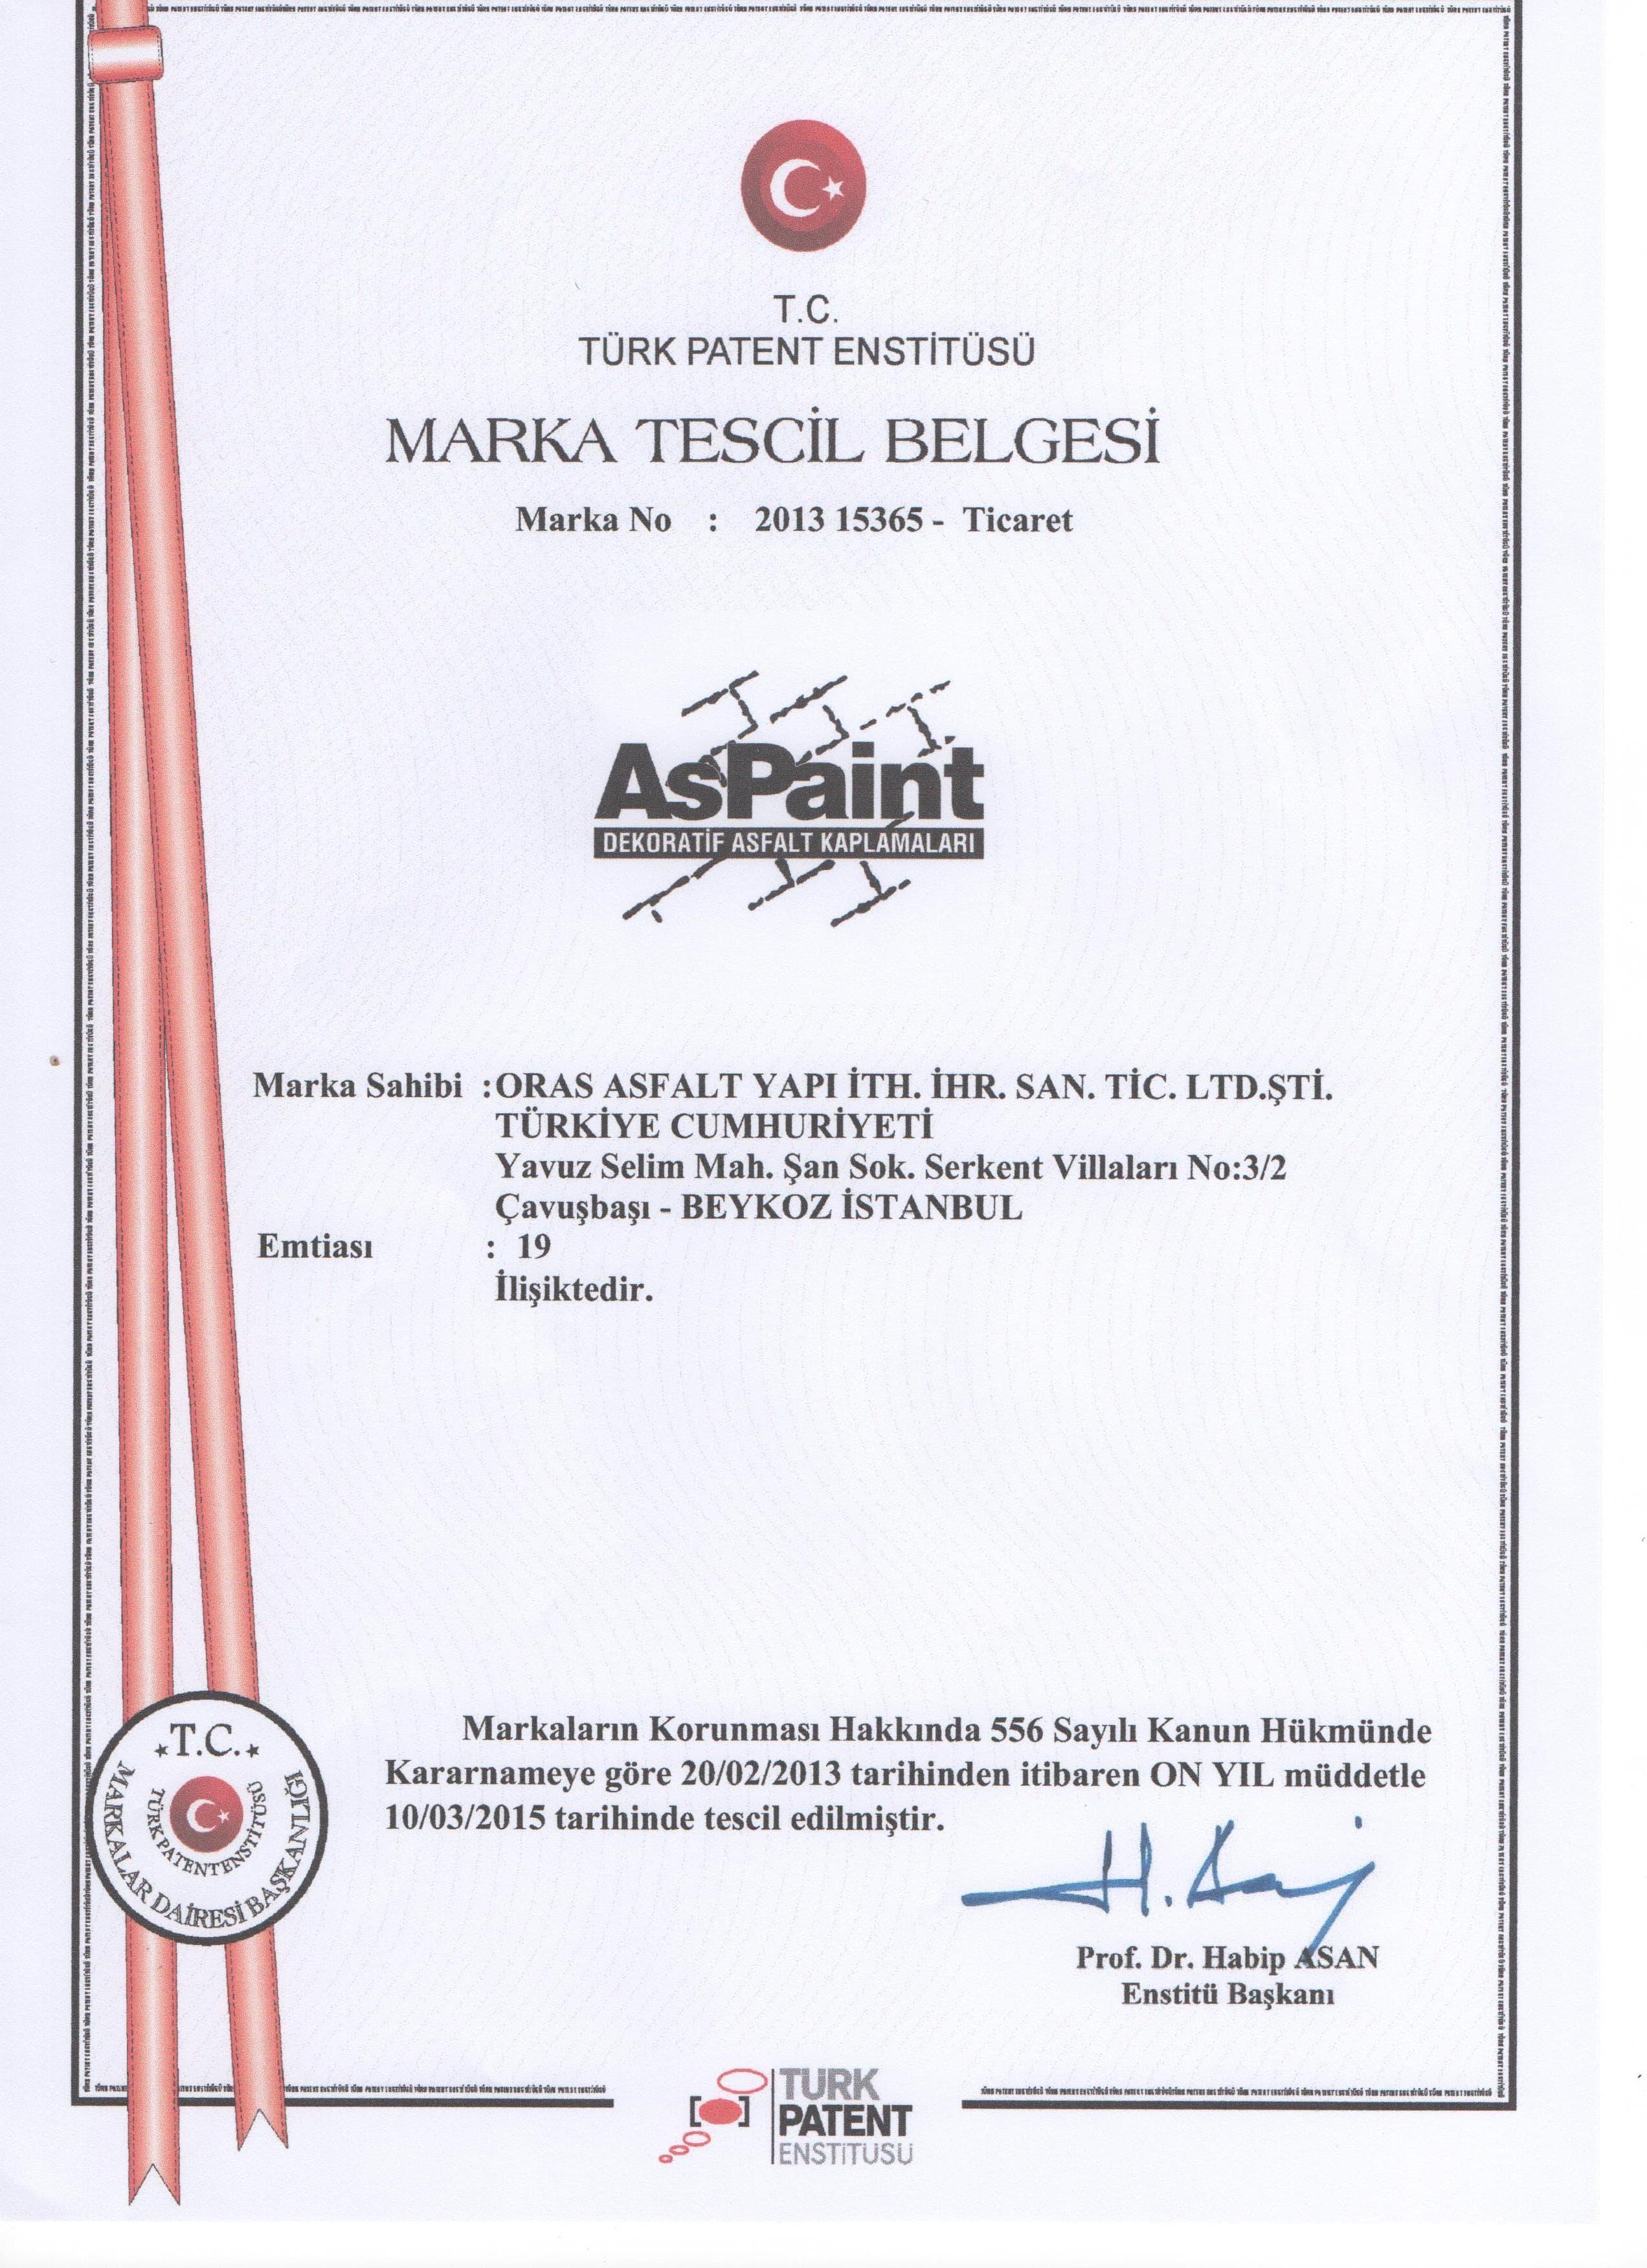 aspaint-asfalt-boyasi-marka-tescil-belgesi-001-min-min